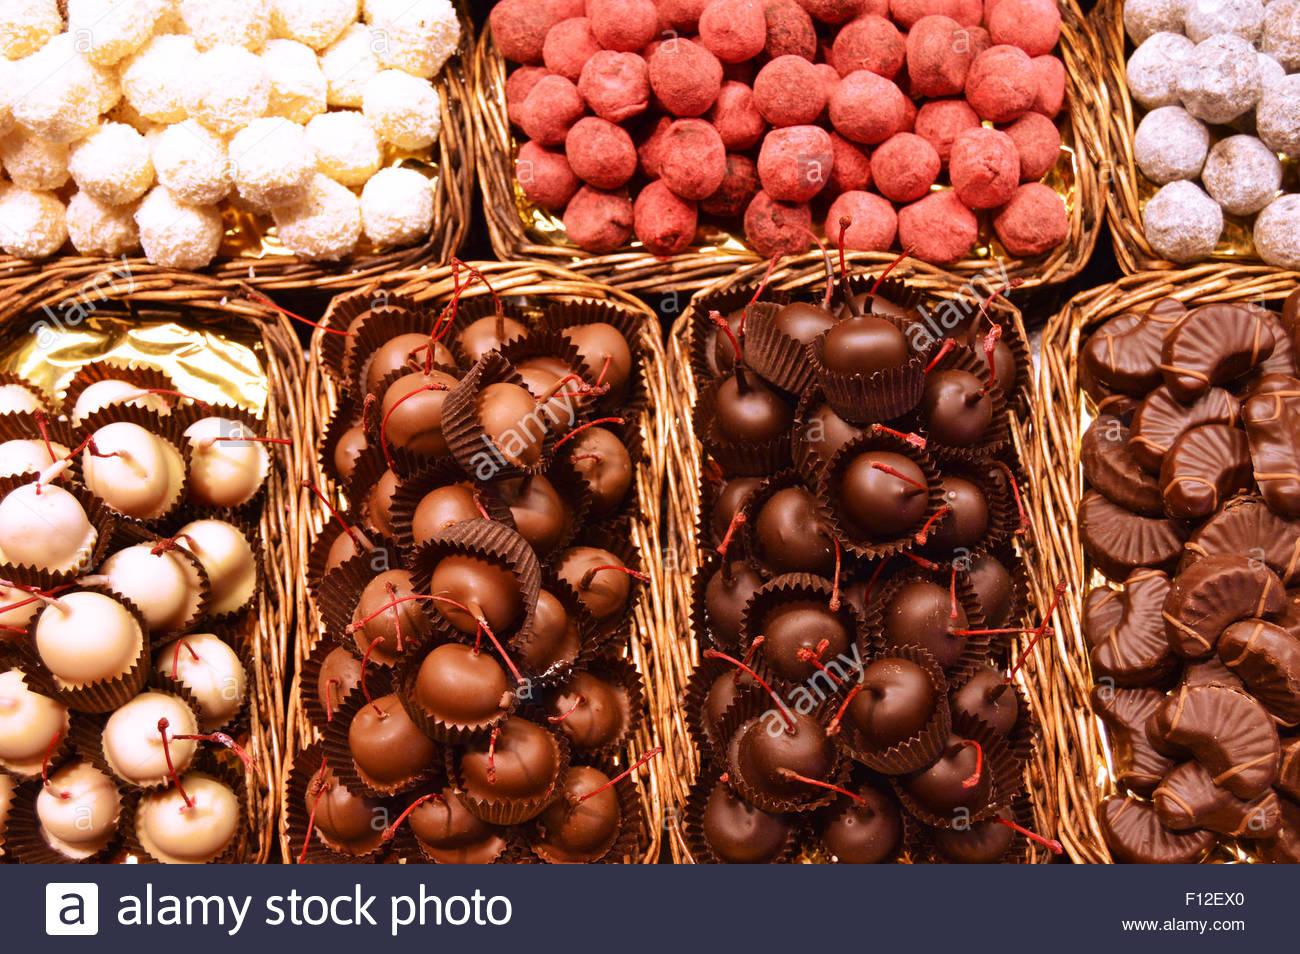 Pralinen Pralinen Auswahl bei La Boqueria-Markt in Ciutat Vella Barcelona Katalonien Spanien Europa Stockbild